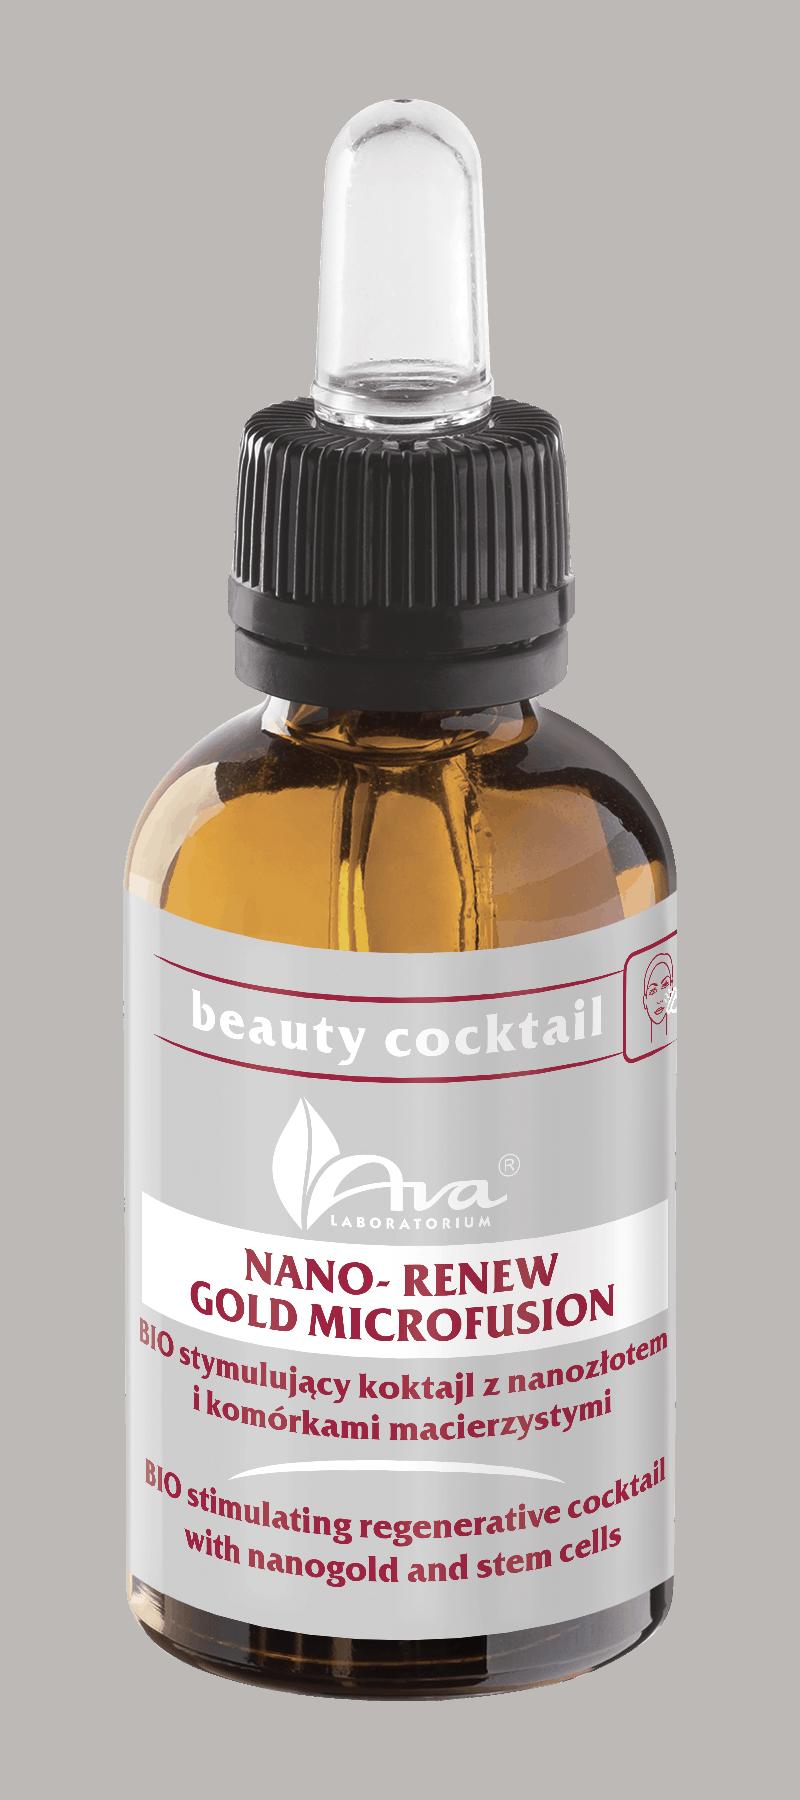 PS_NanoRenew_Bottle_PL